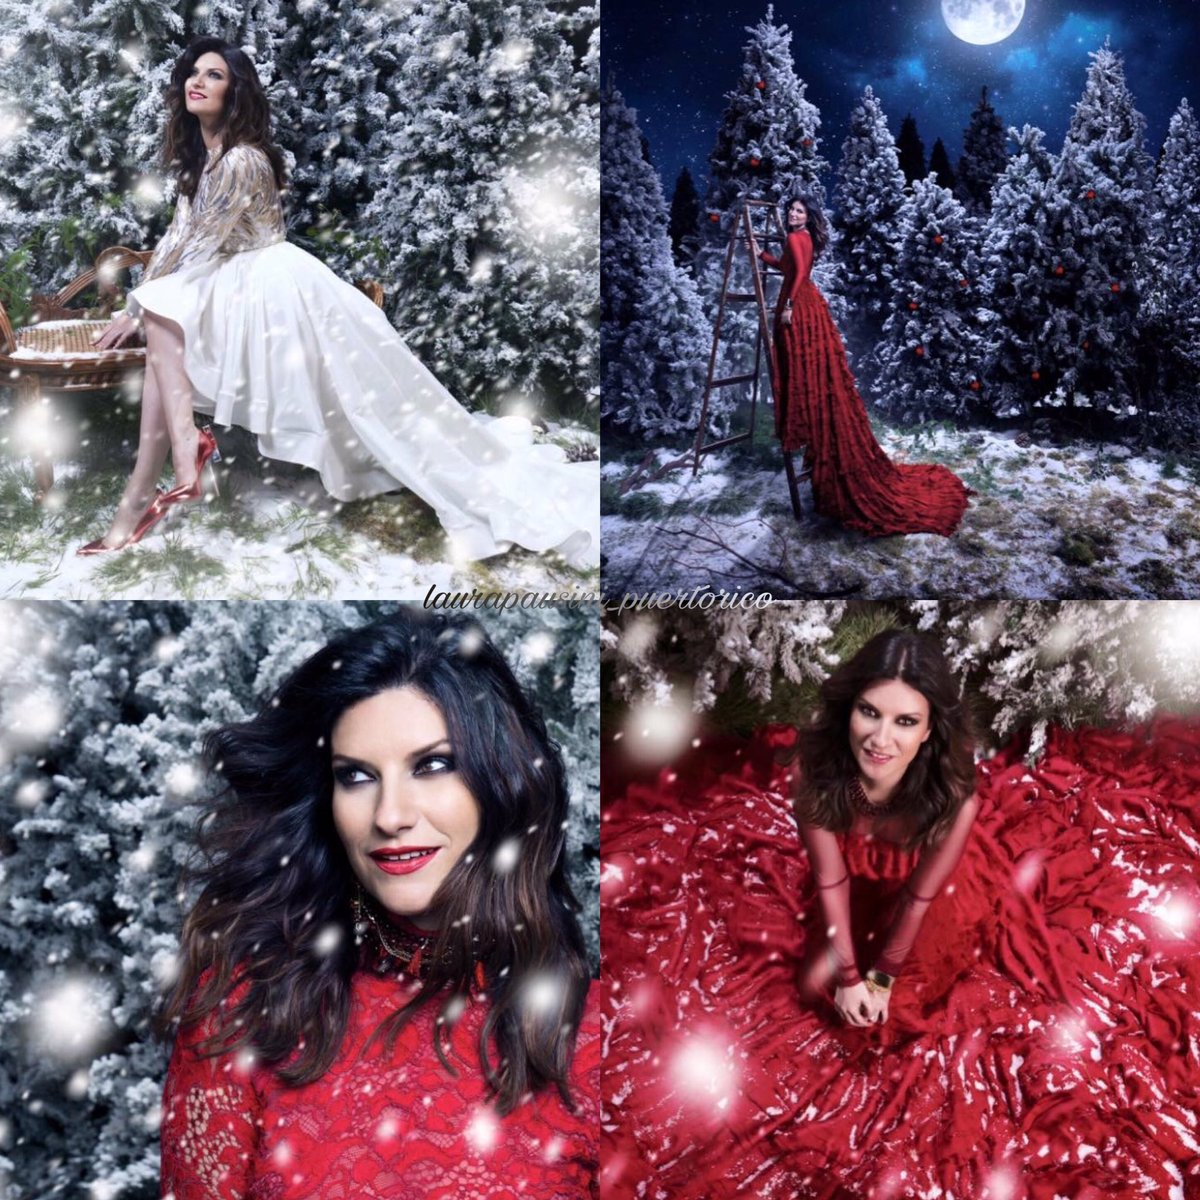 Laura xMas l'album di Natale di Laura Pausini.